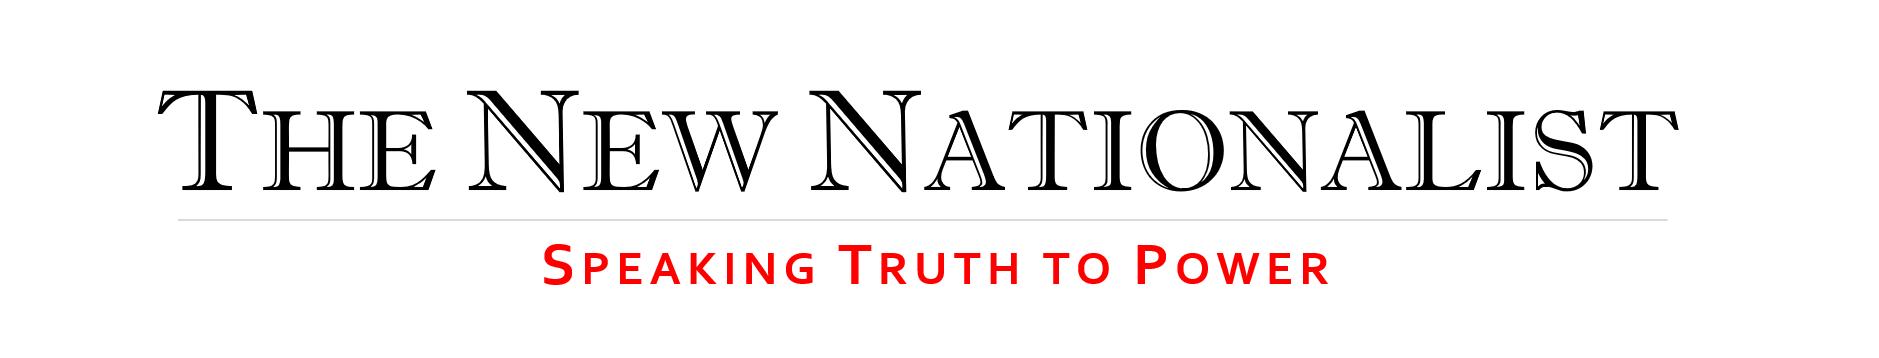 TNN Masthead c1 2018